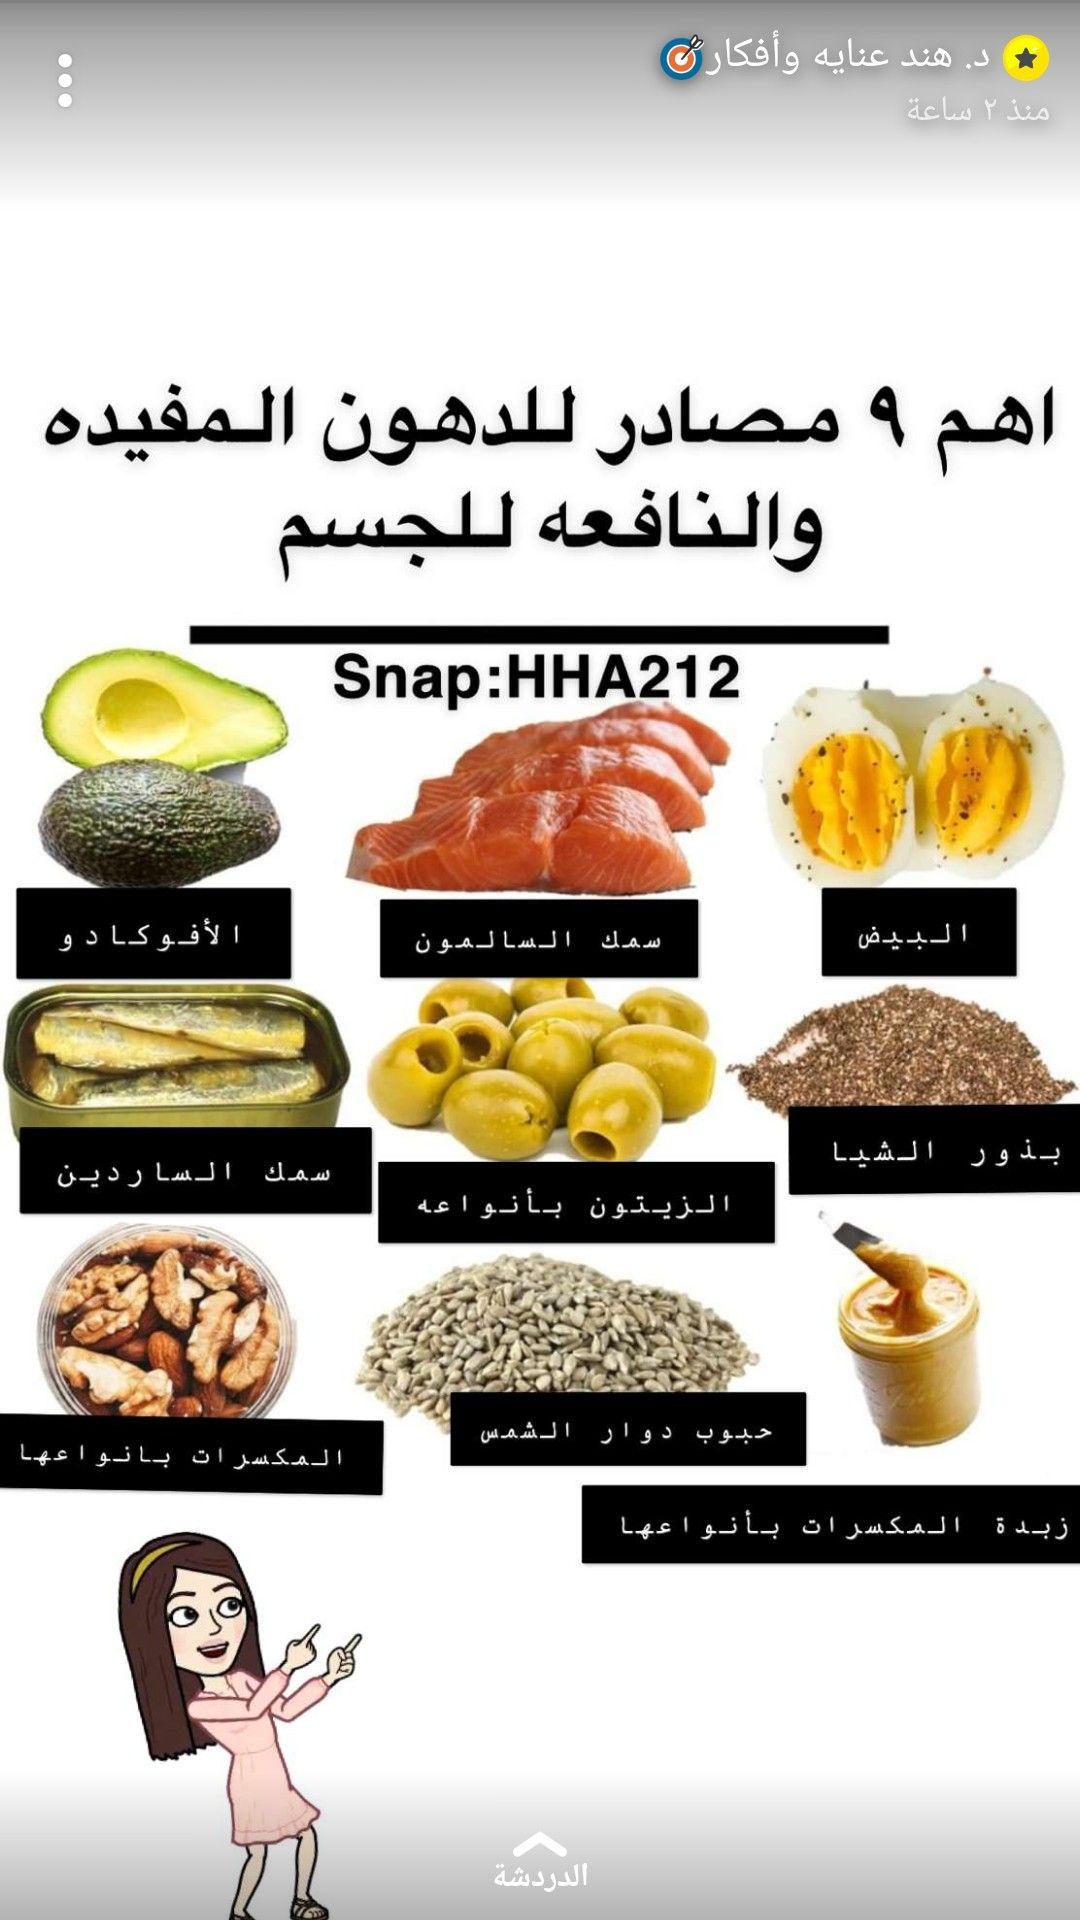 Pin By Nona Abdullah On د هند عنايه وافكار Healty Eating Healthy Fridge Fruit Benefits